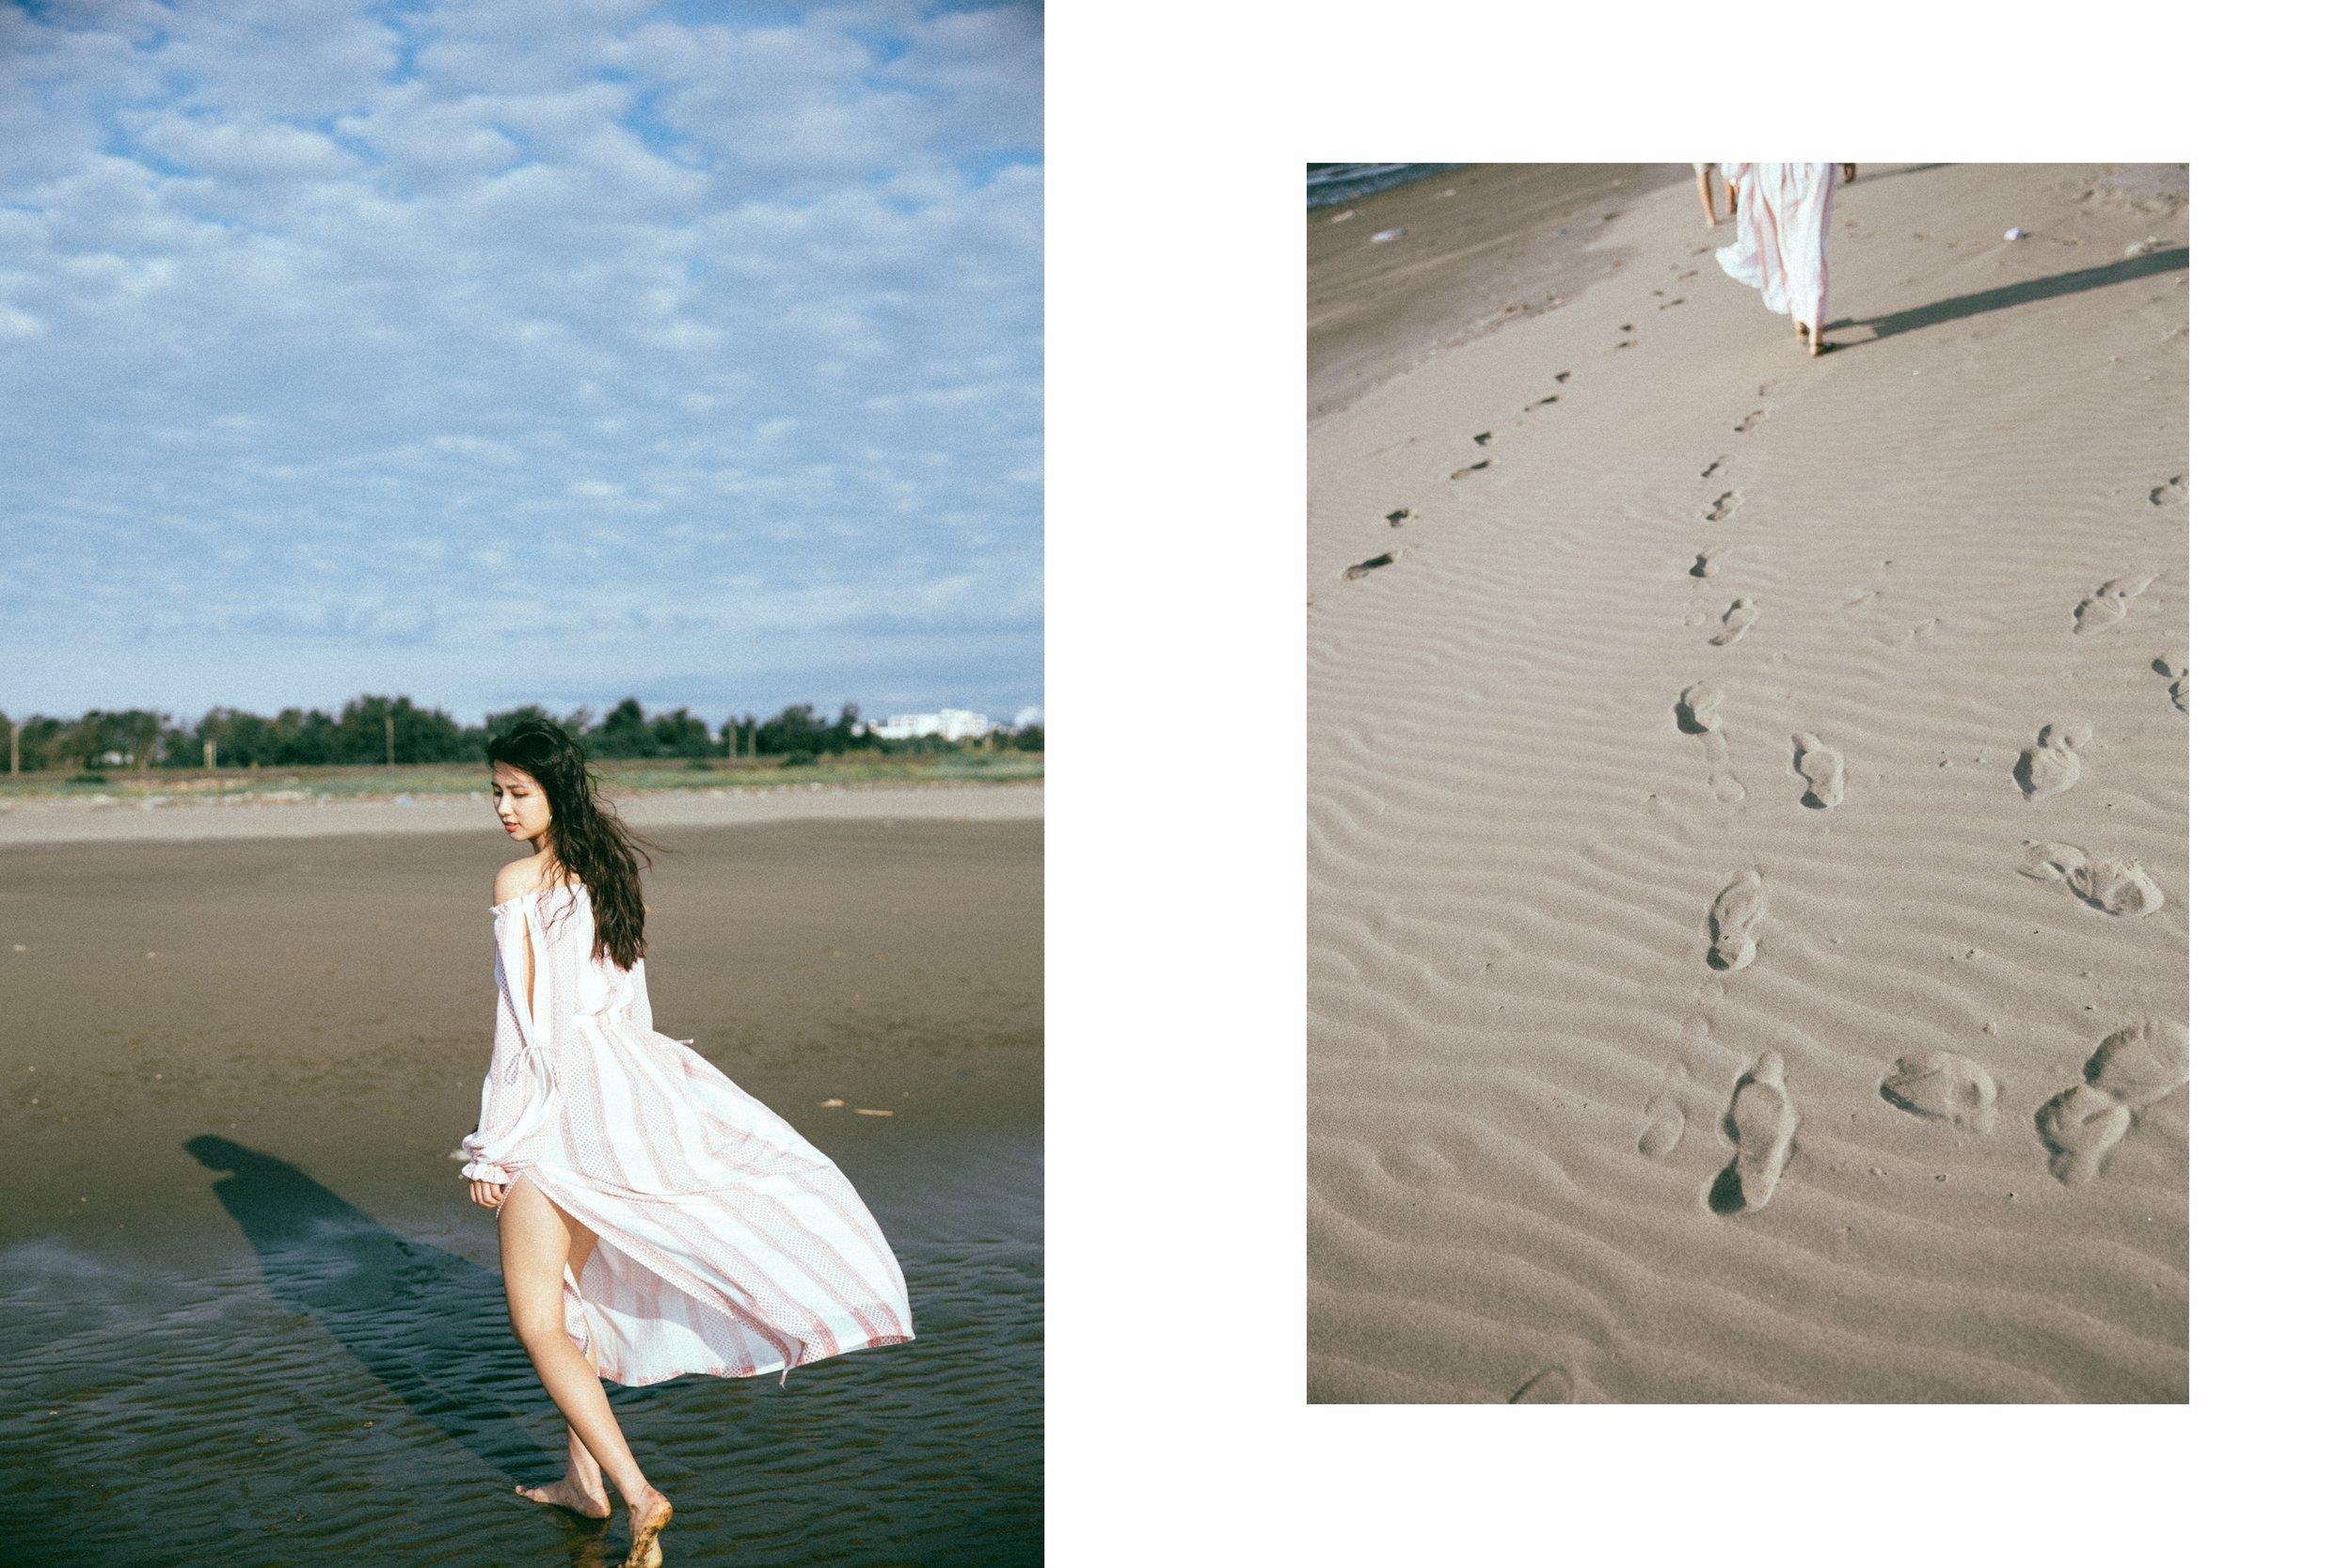 portrait-jane-girl-寫真-許厝港-桃園-28.jpg